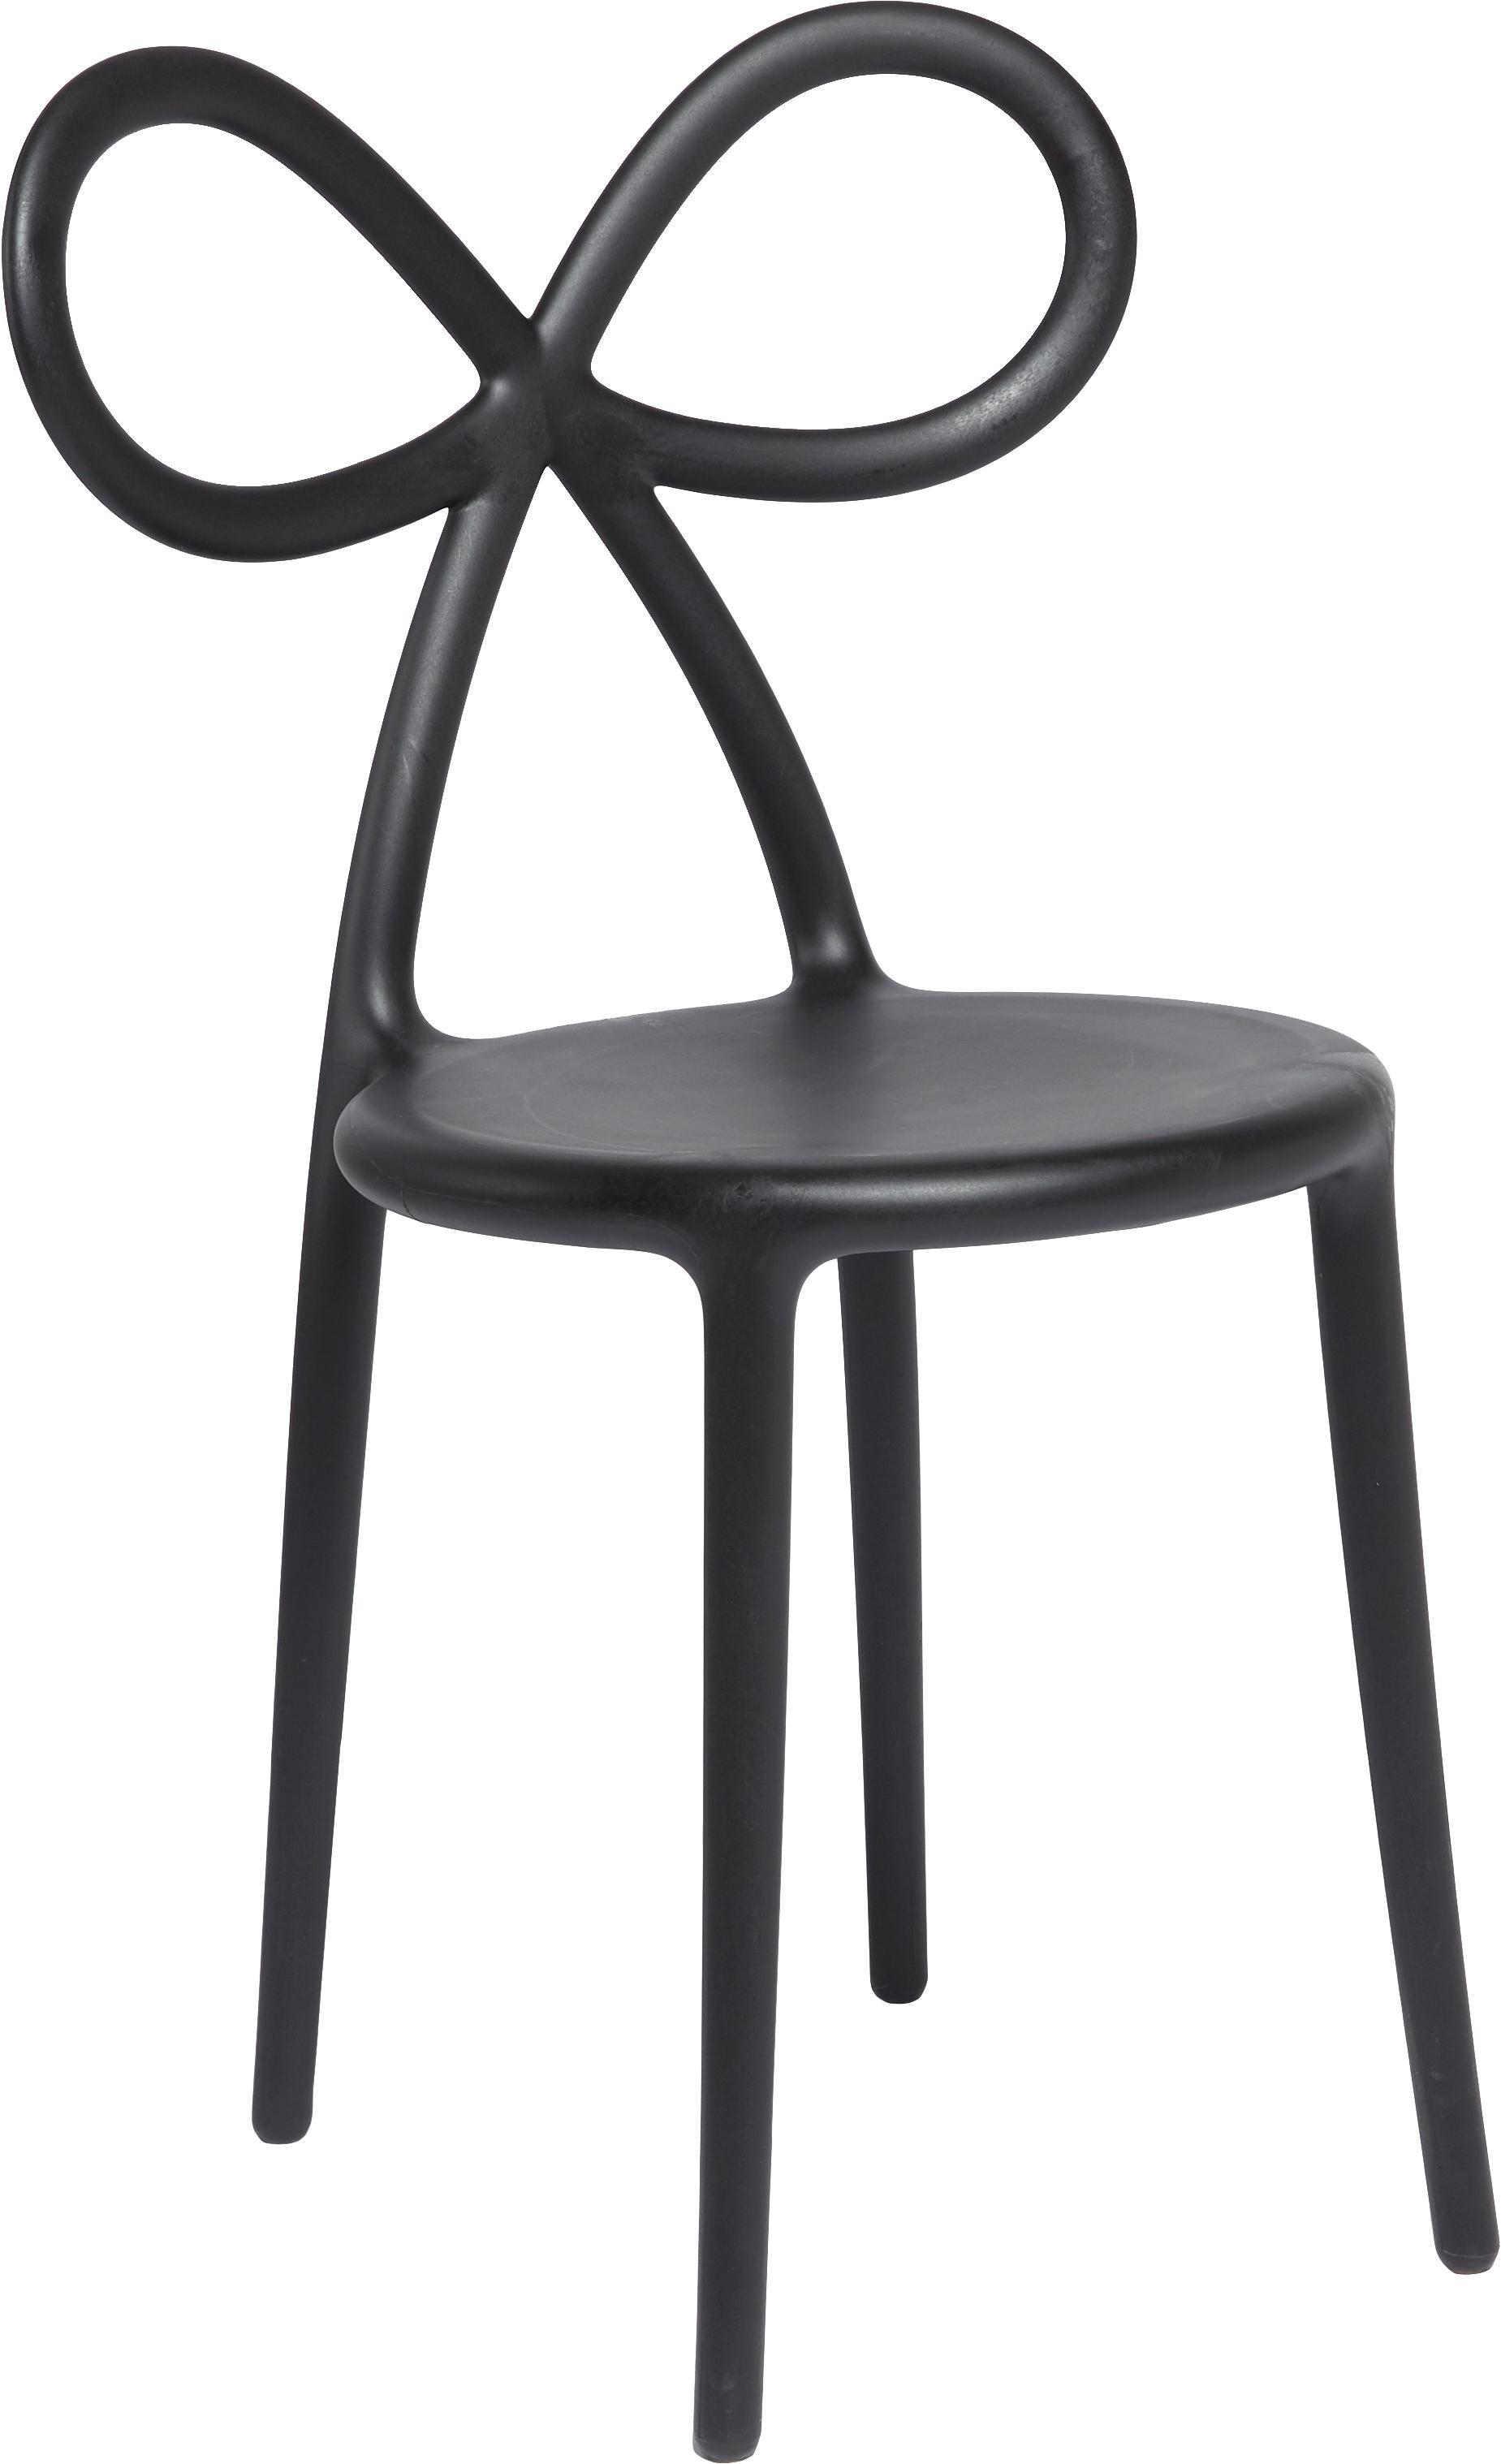 Kunststoff-Stuhl Ribbon in Schwarz, Kunststoff (Polypropylen), Schwarz, B 53 x T 52 cm